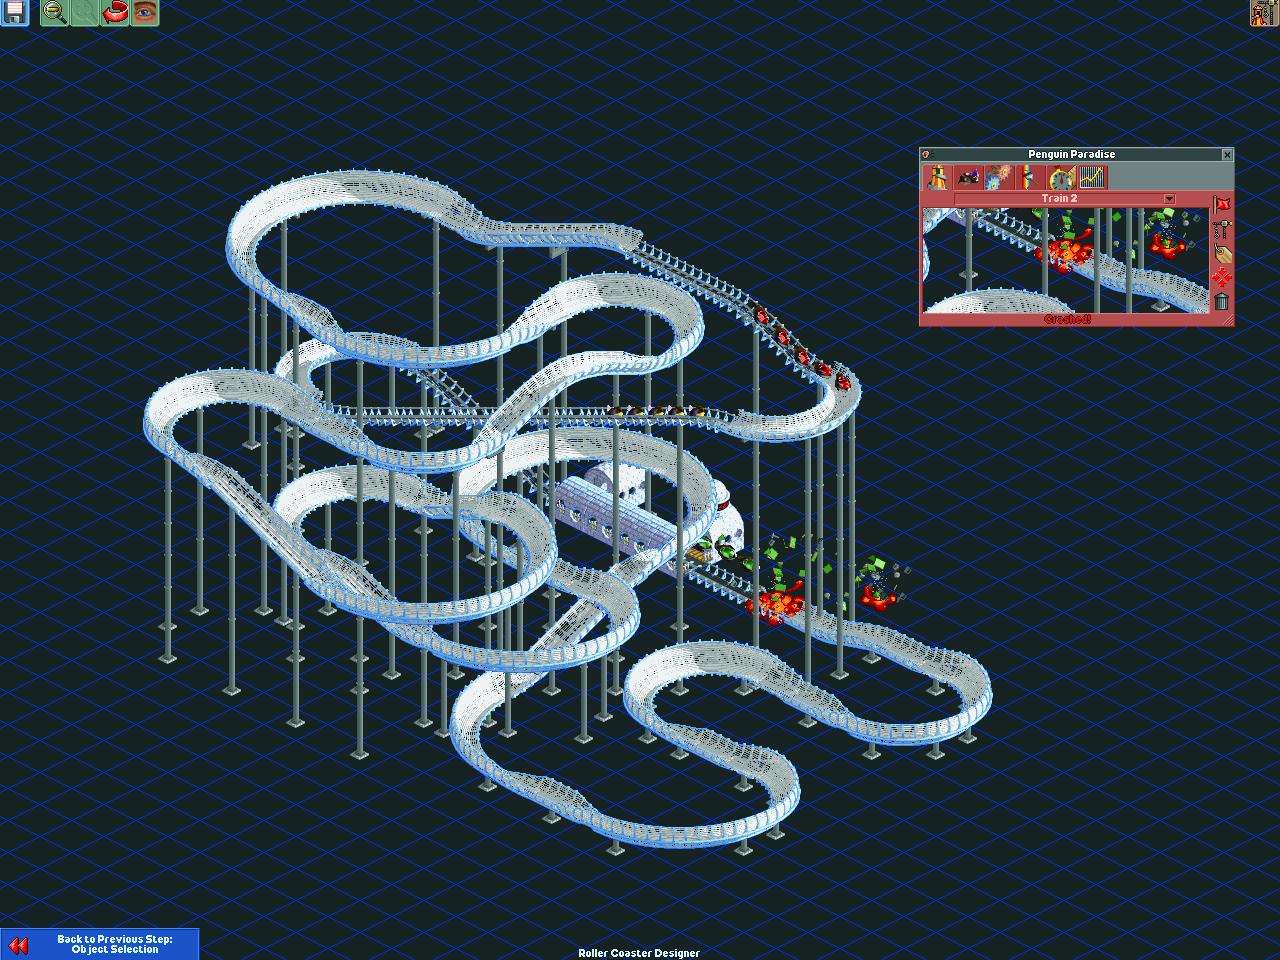 Crash | RollerCoaster Tycoon | FANDOM powered by Wikia